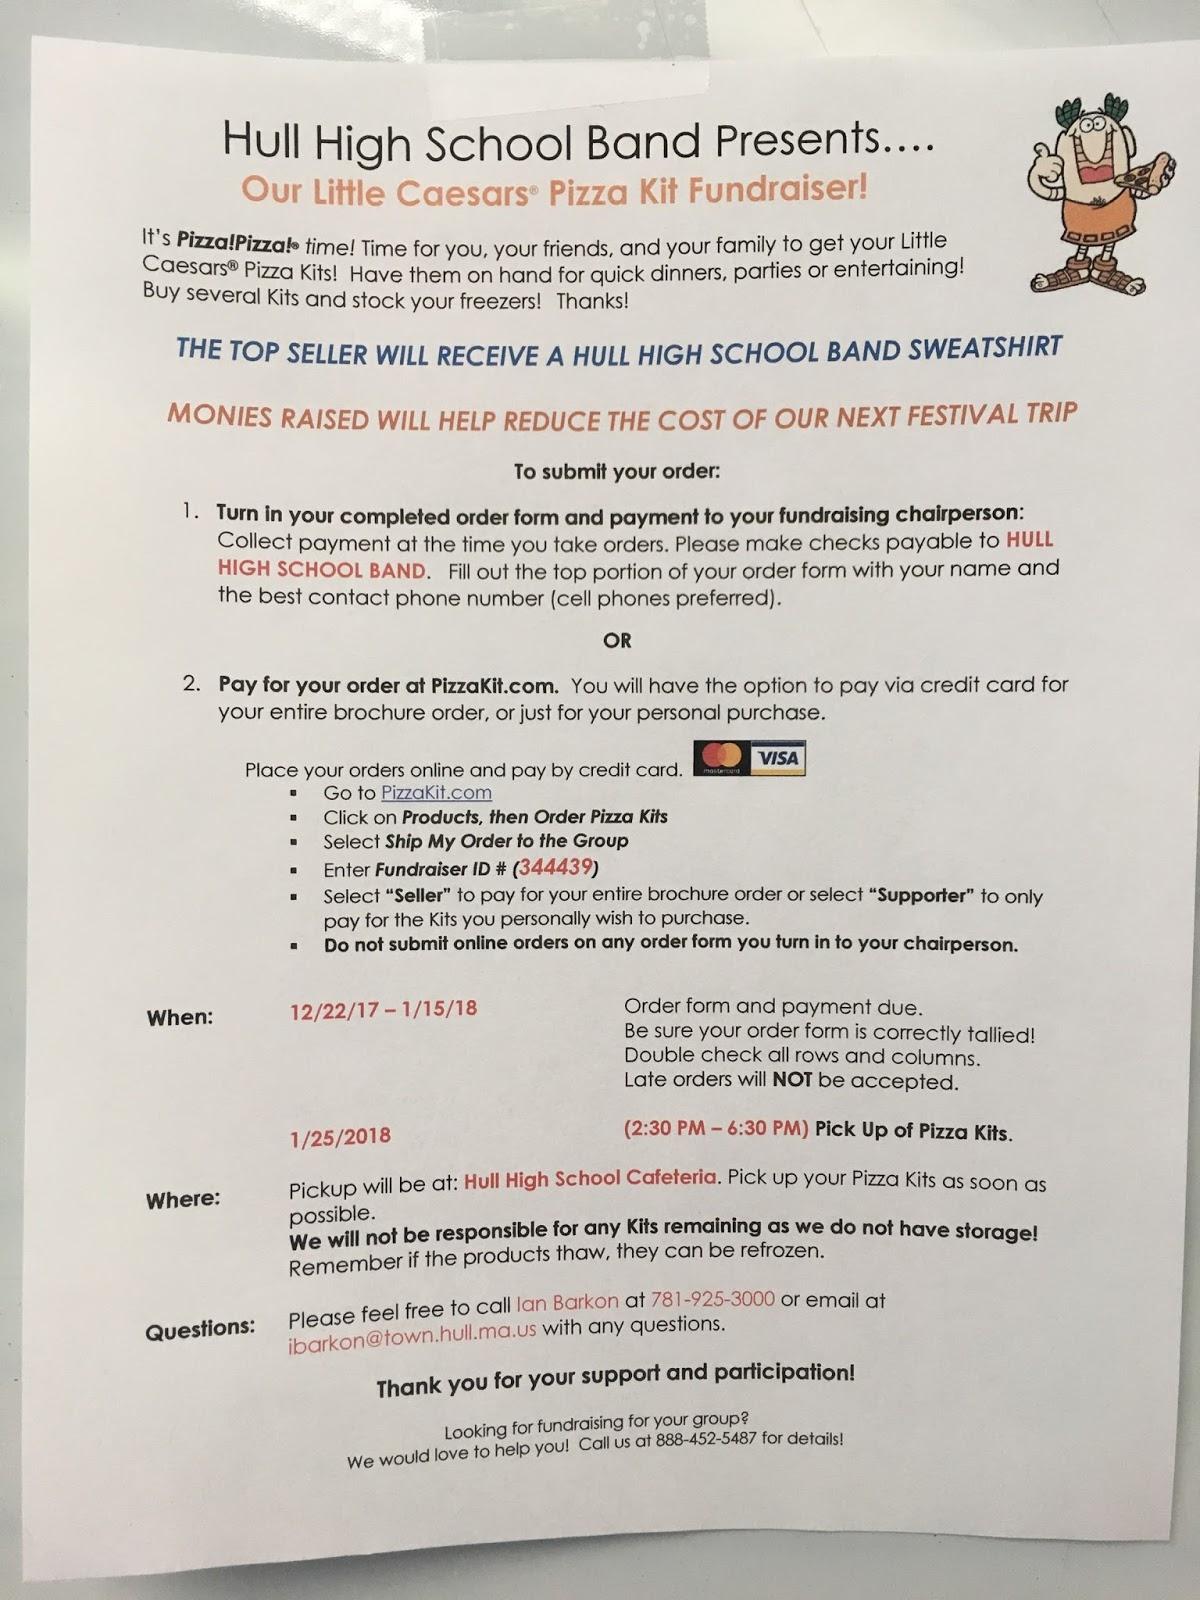 The Hull High School Blog: HULL HIGH SCHOOL BAND PRESENTS - PIZZA!!!!!!!